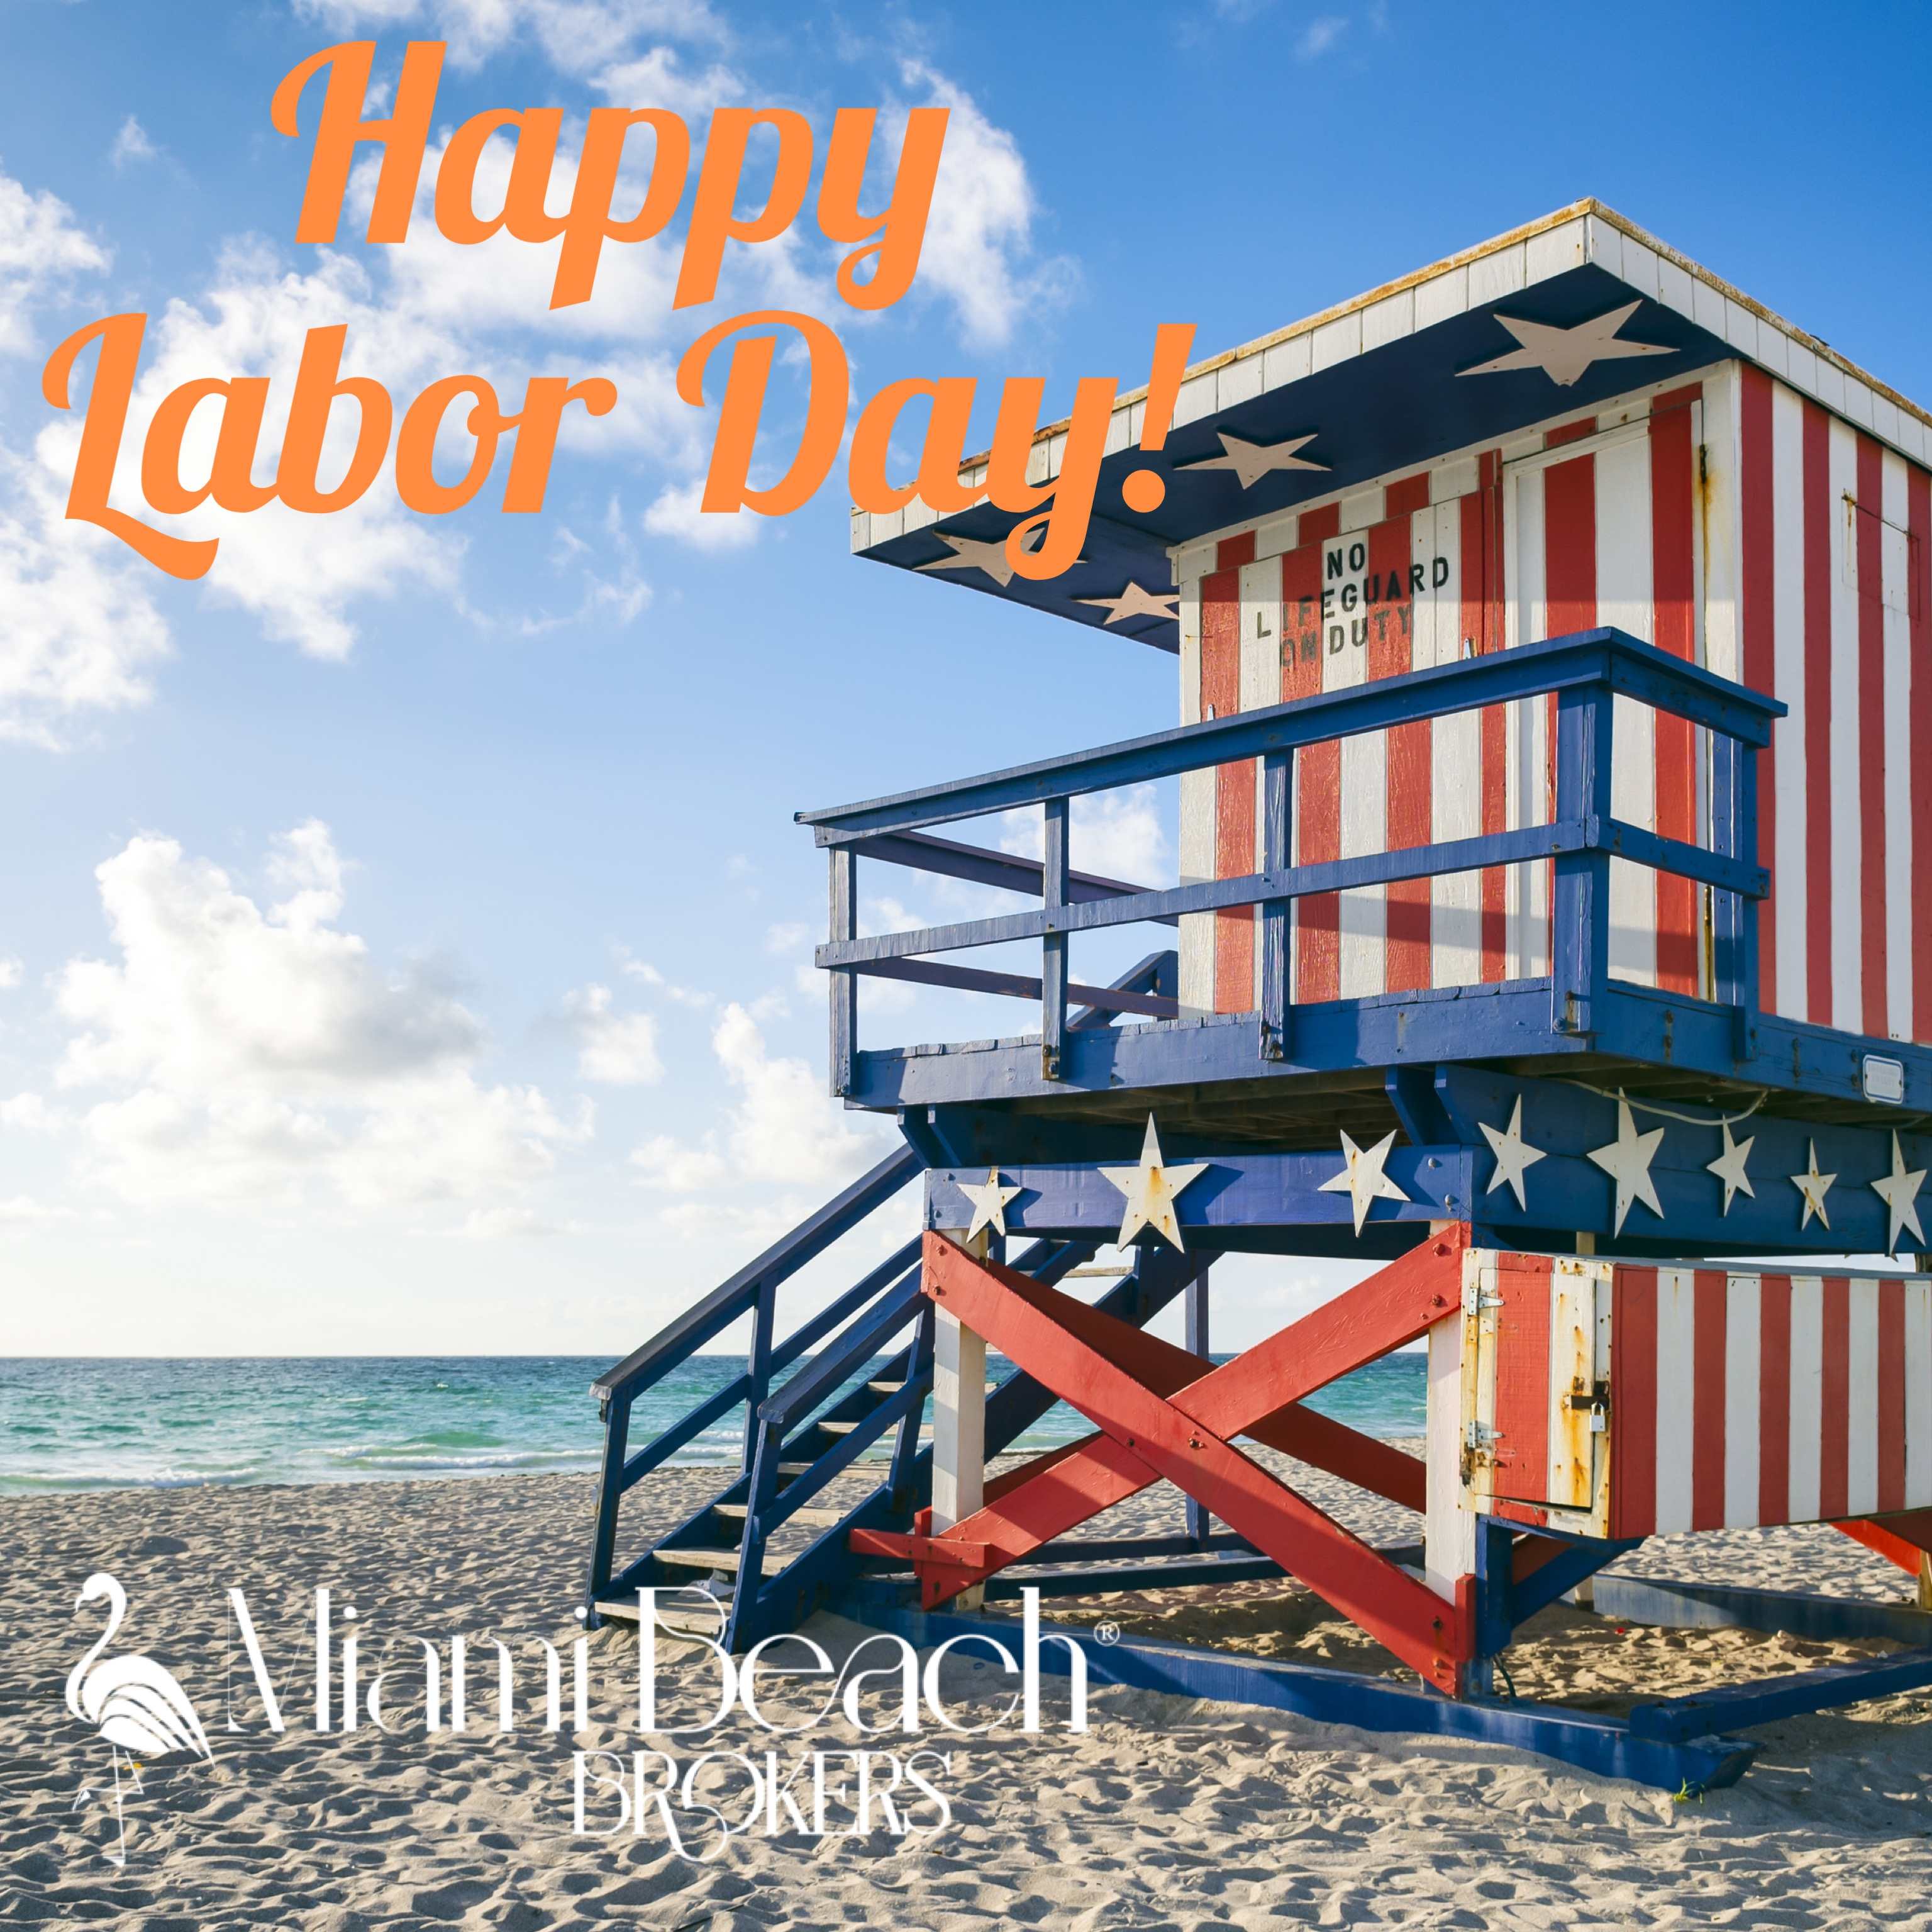 Happy Labor Day 2021 from Miami Beach Brokers®